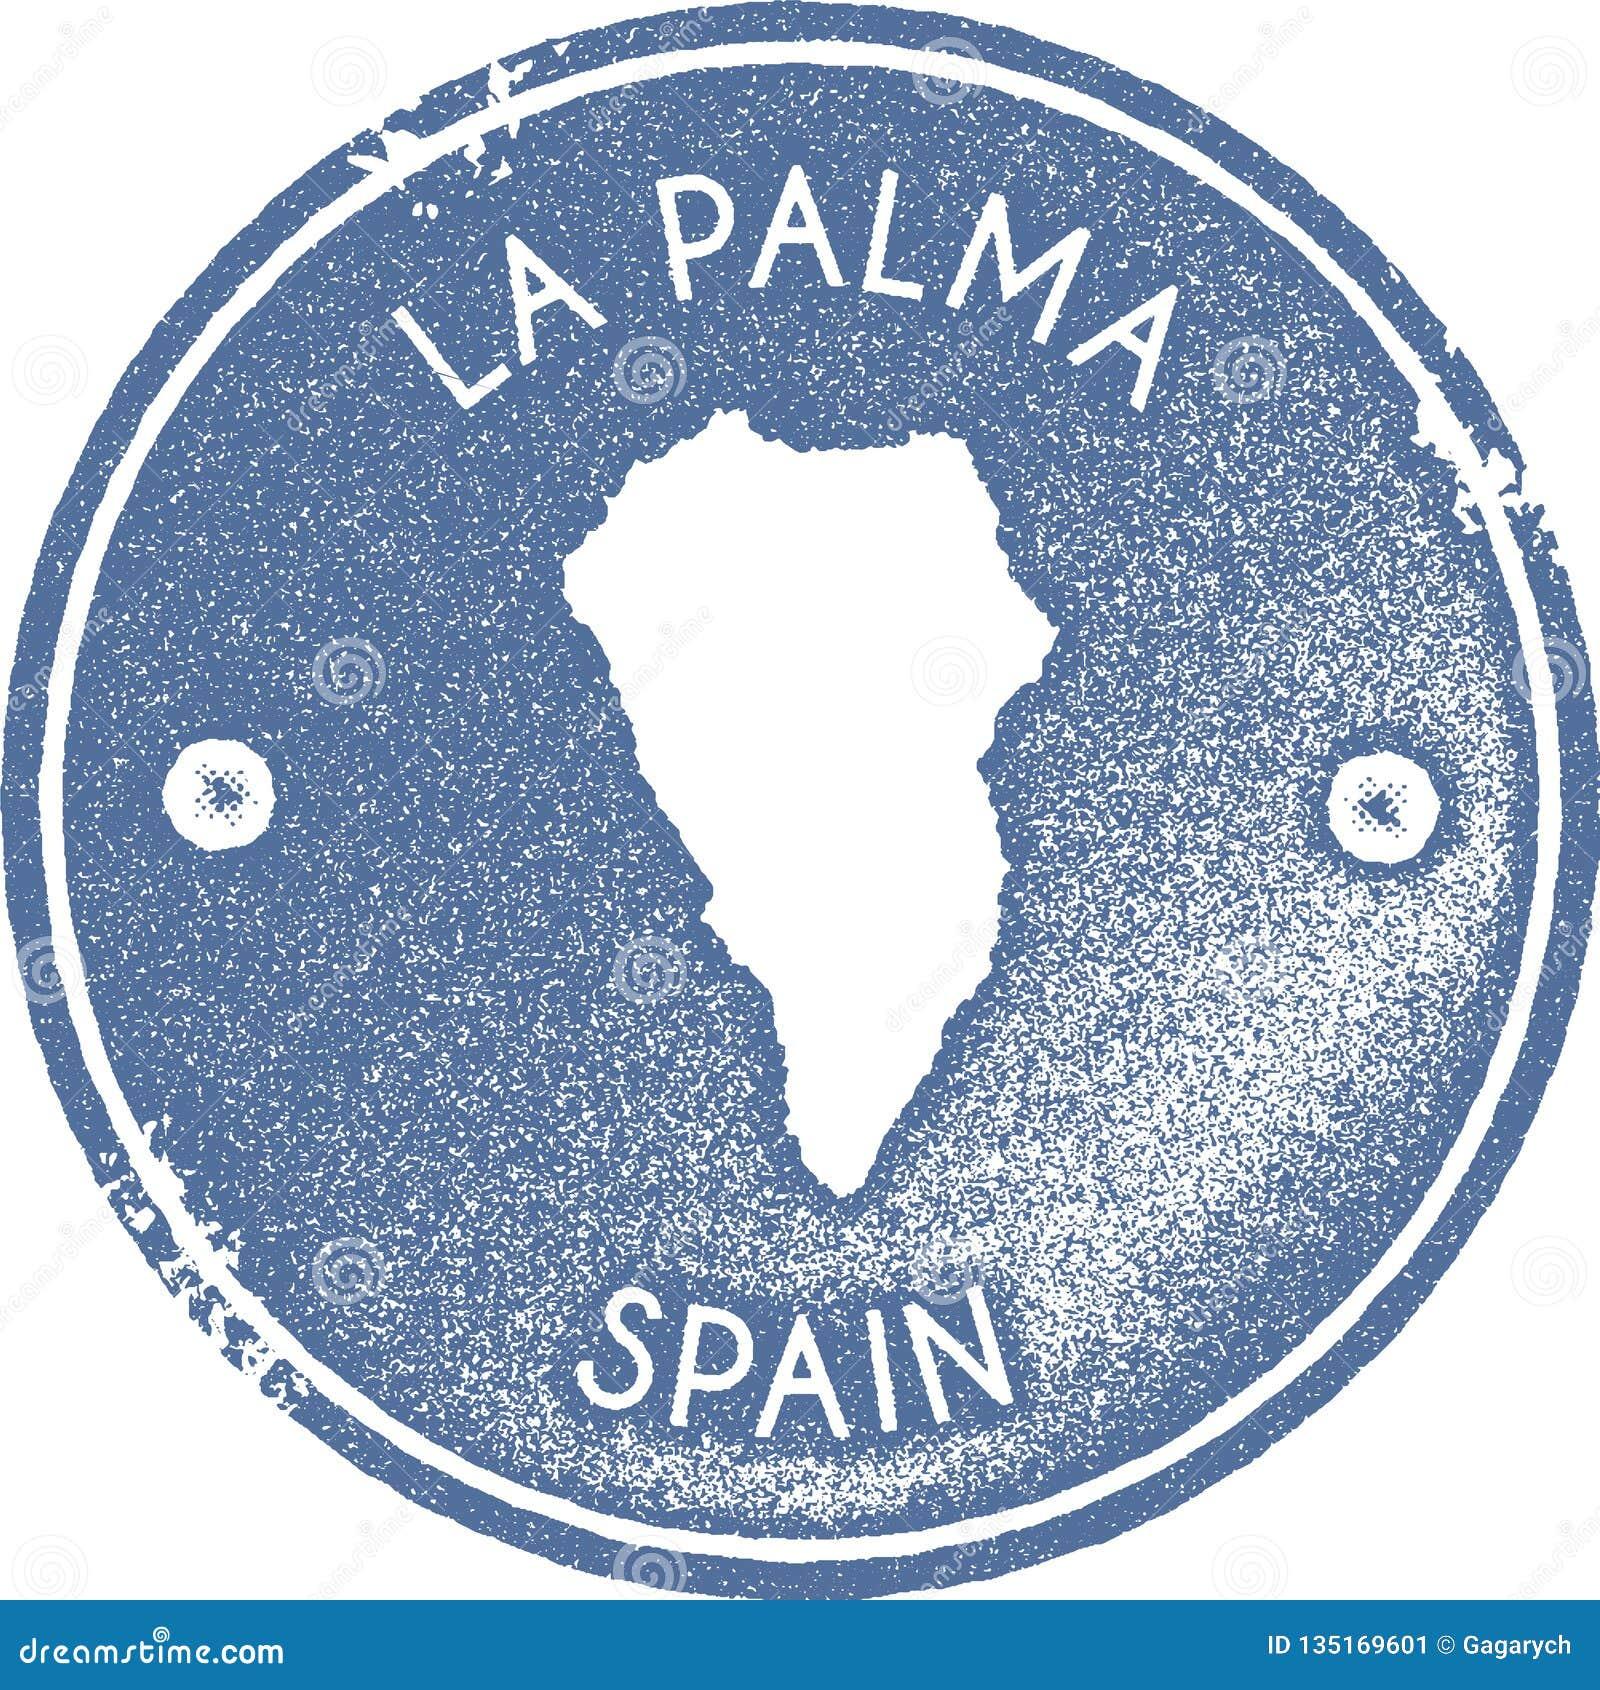 La Palma Map Vintage Stamp. Stock Vector - Illustration of light ...